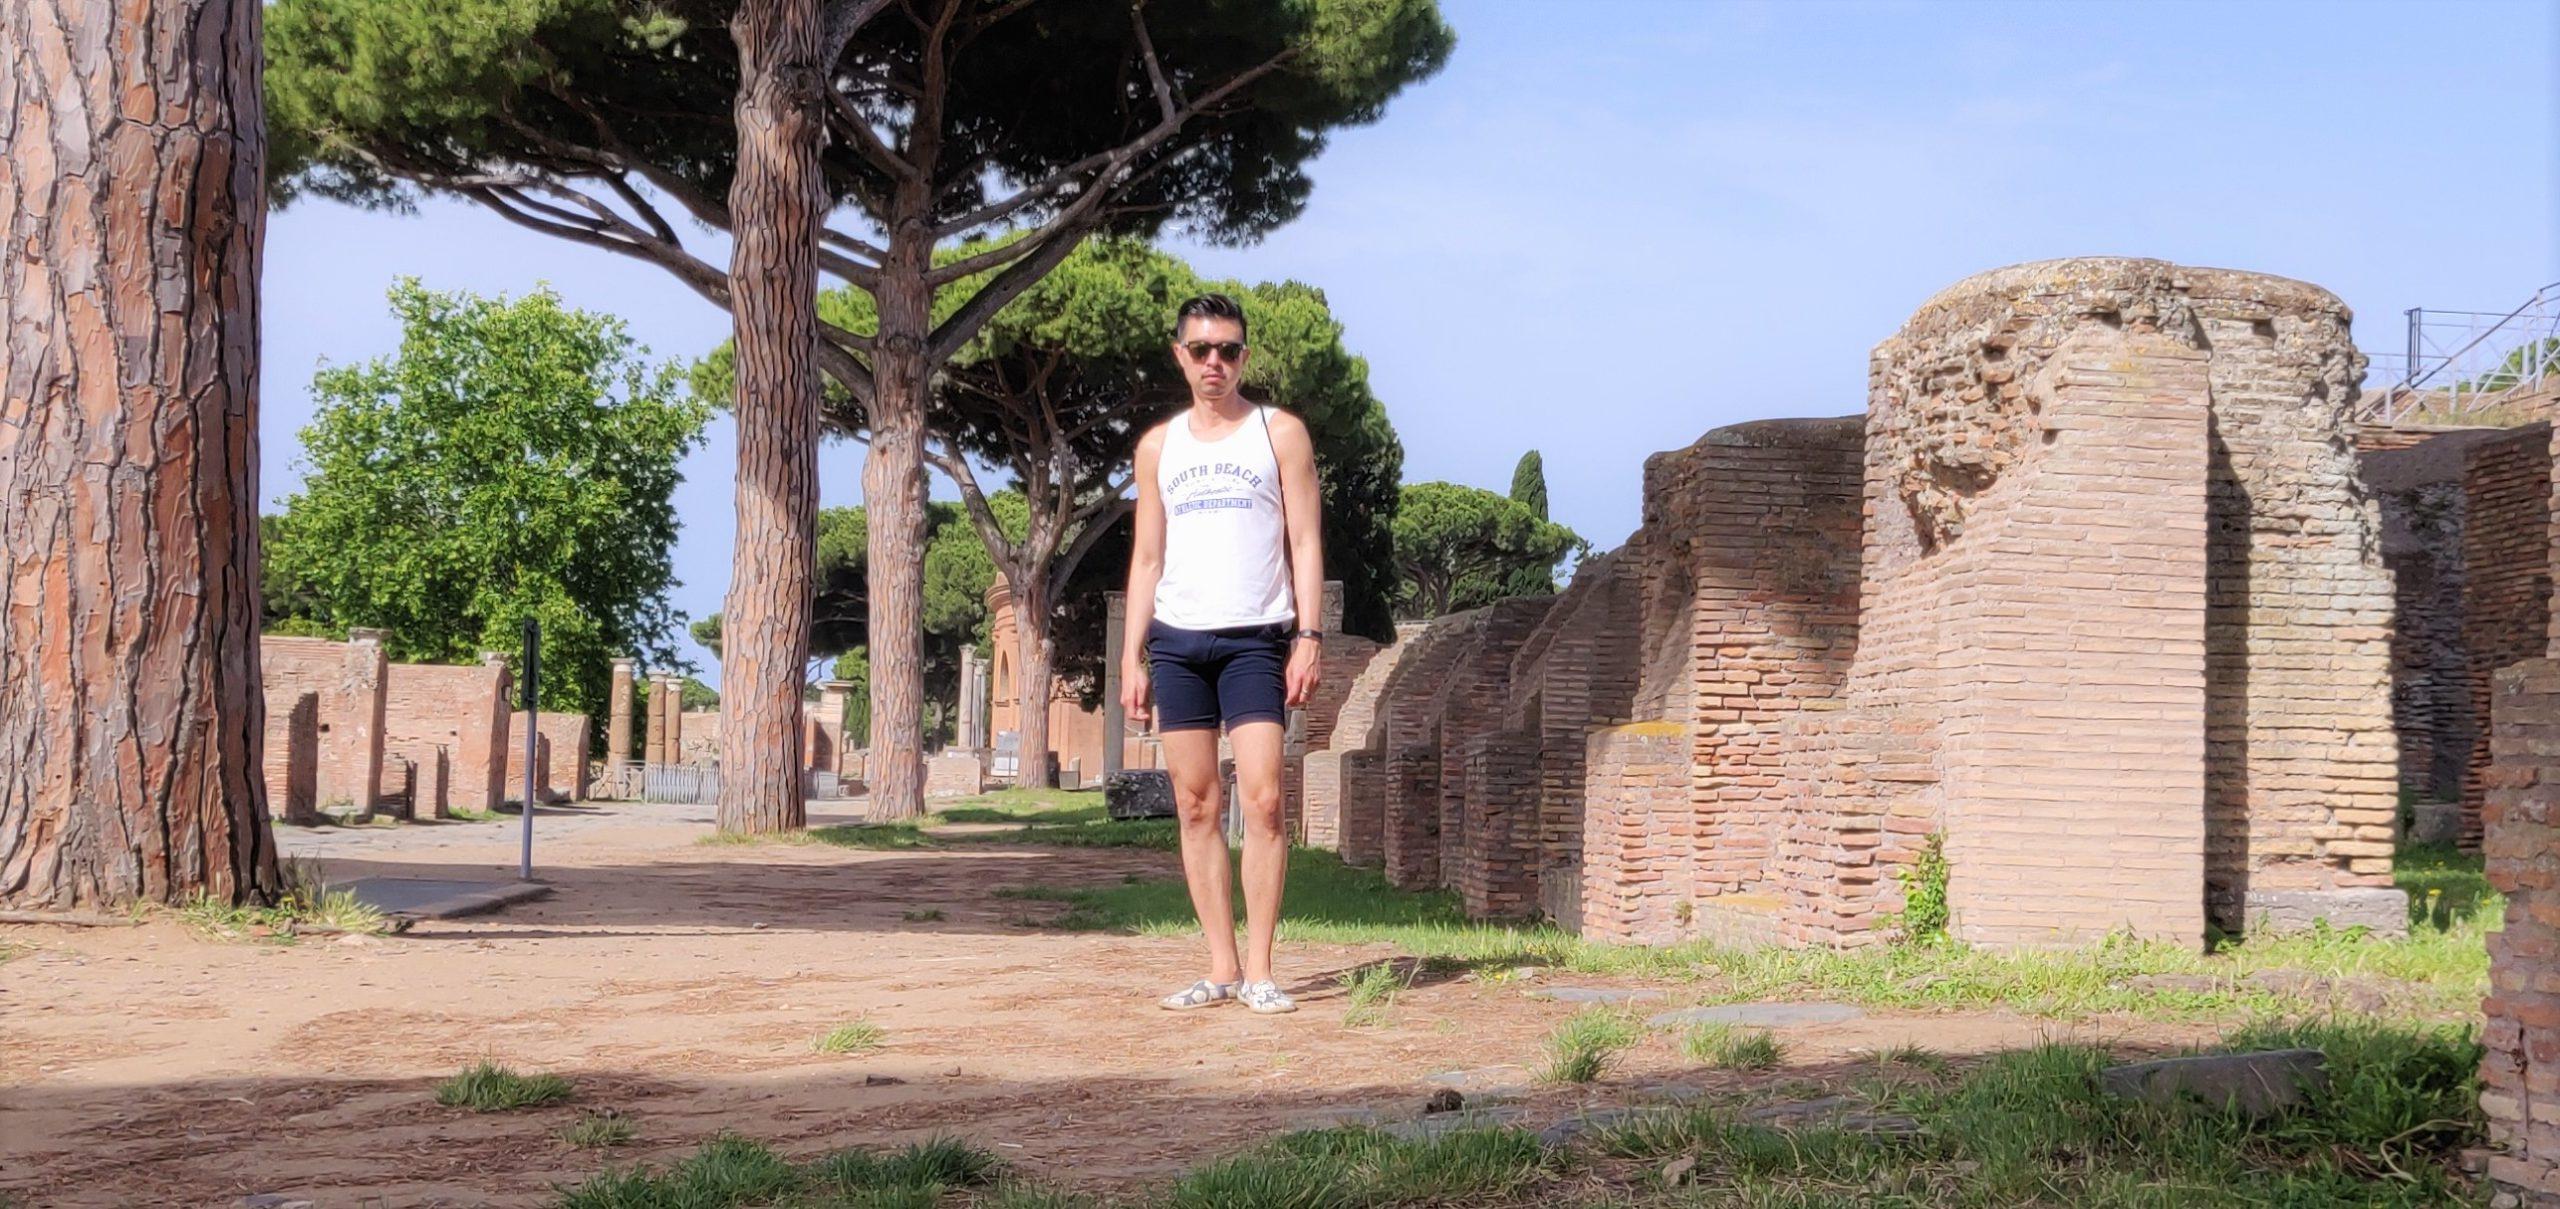 Ostia Antica: Rome's Forgotten Seaside Resort